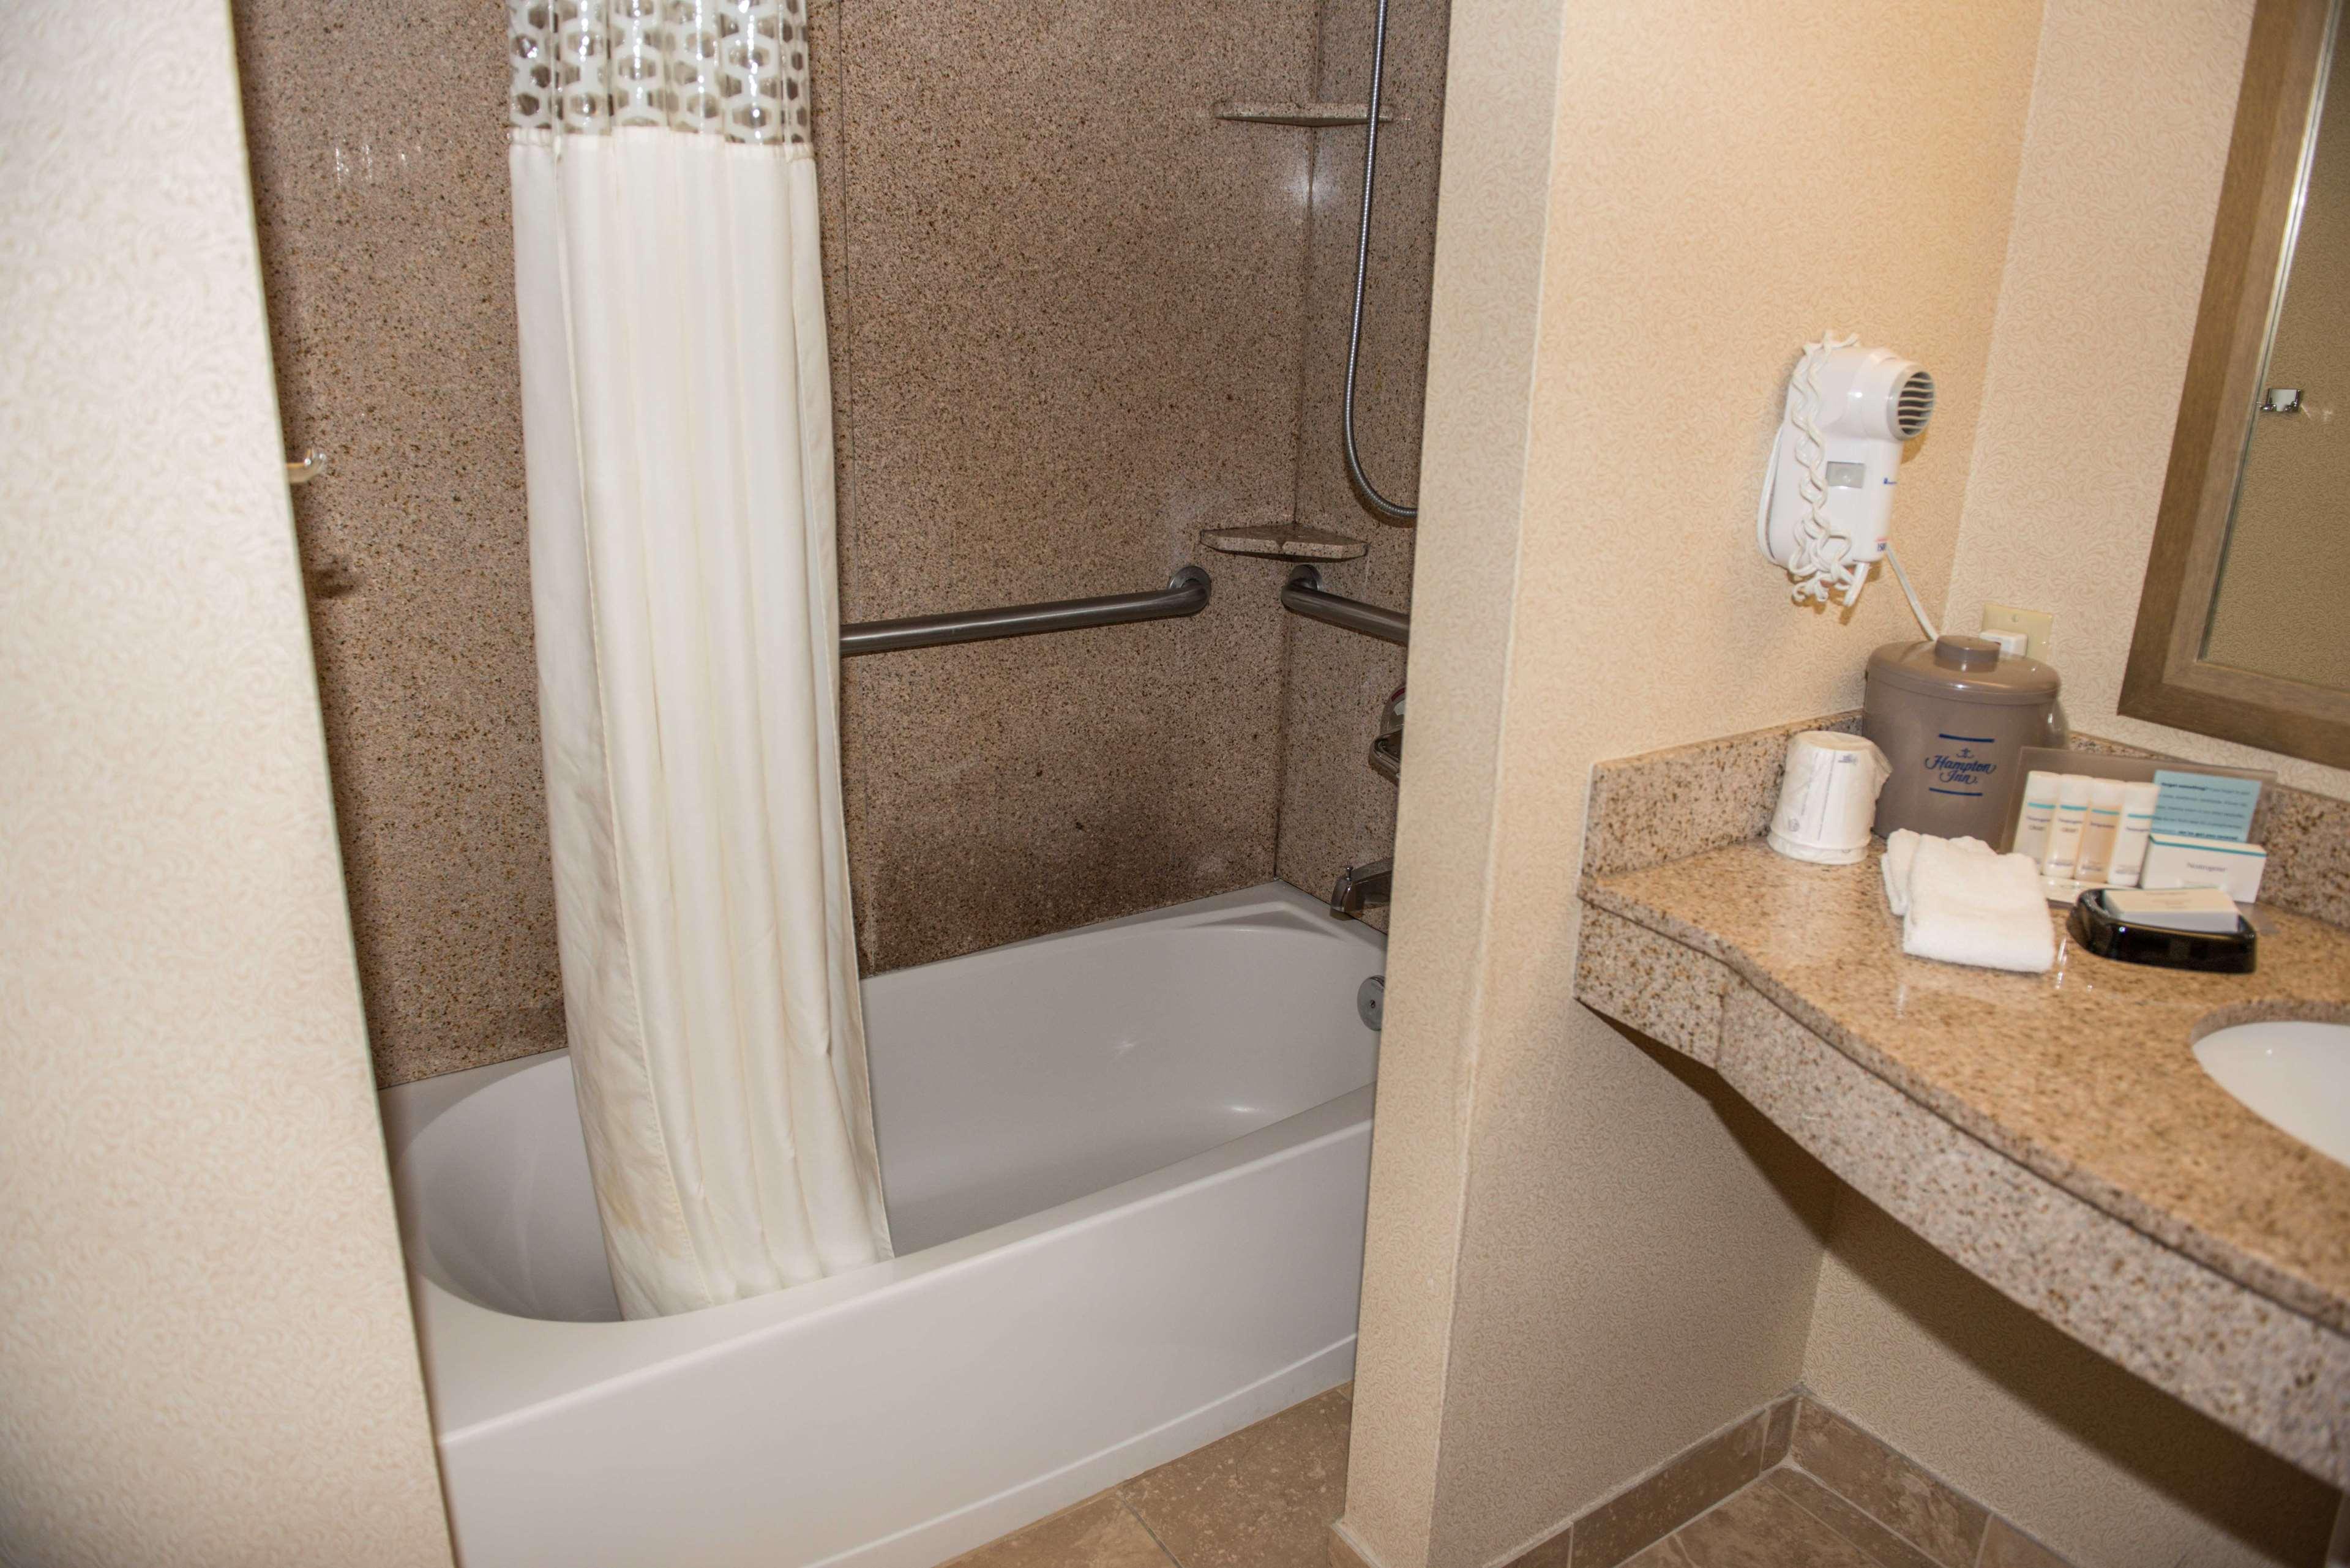 Hampton Inn & Suites Bremerton image 41